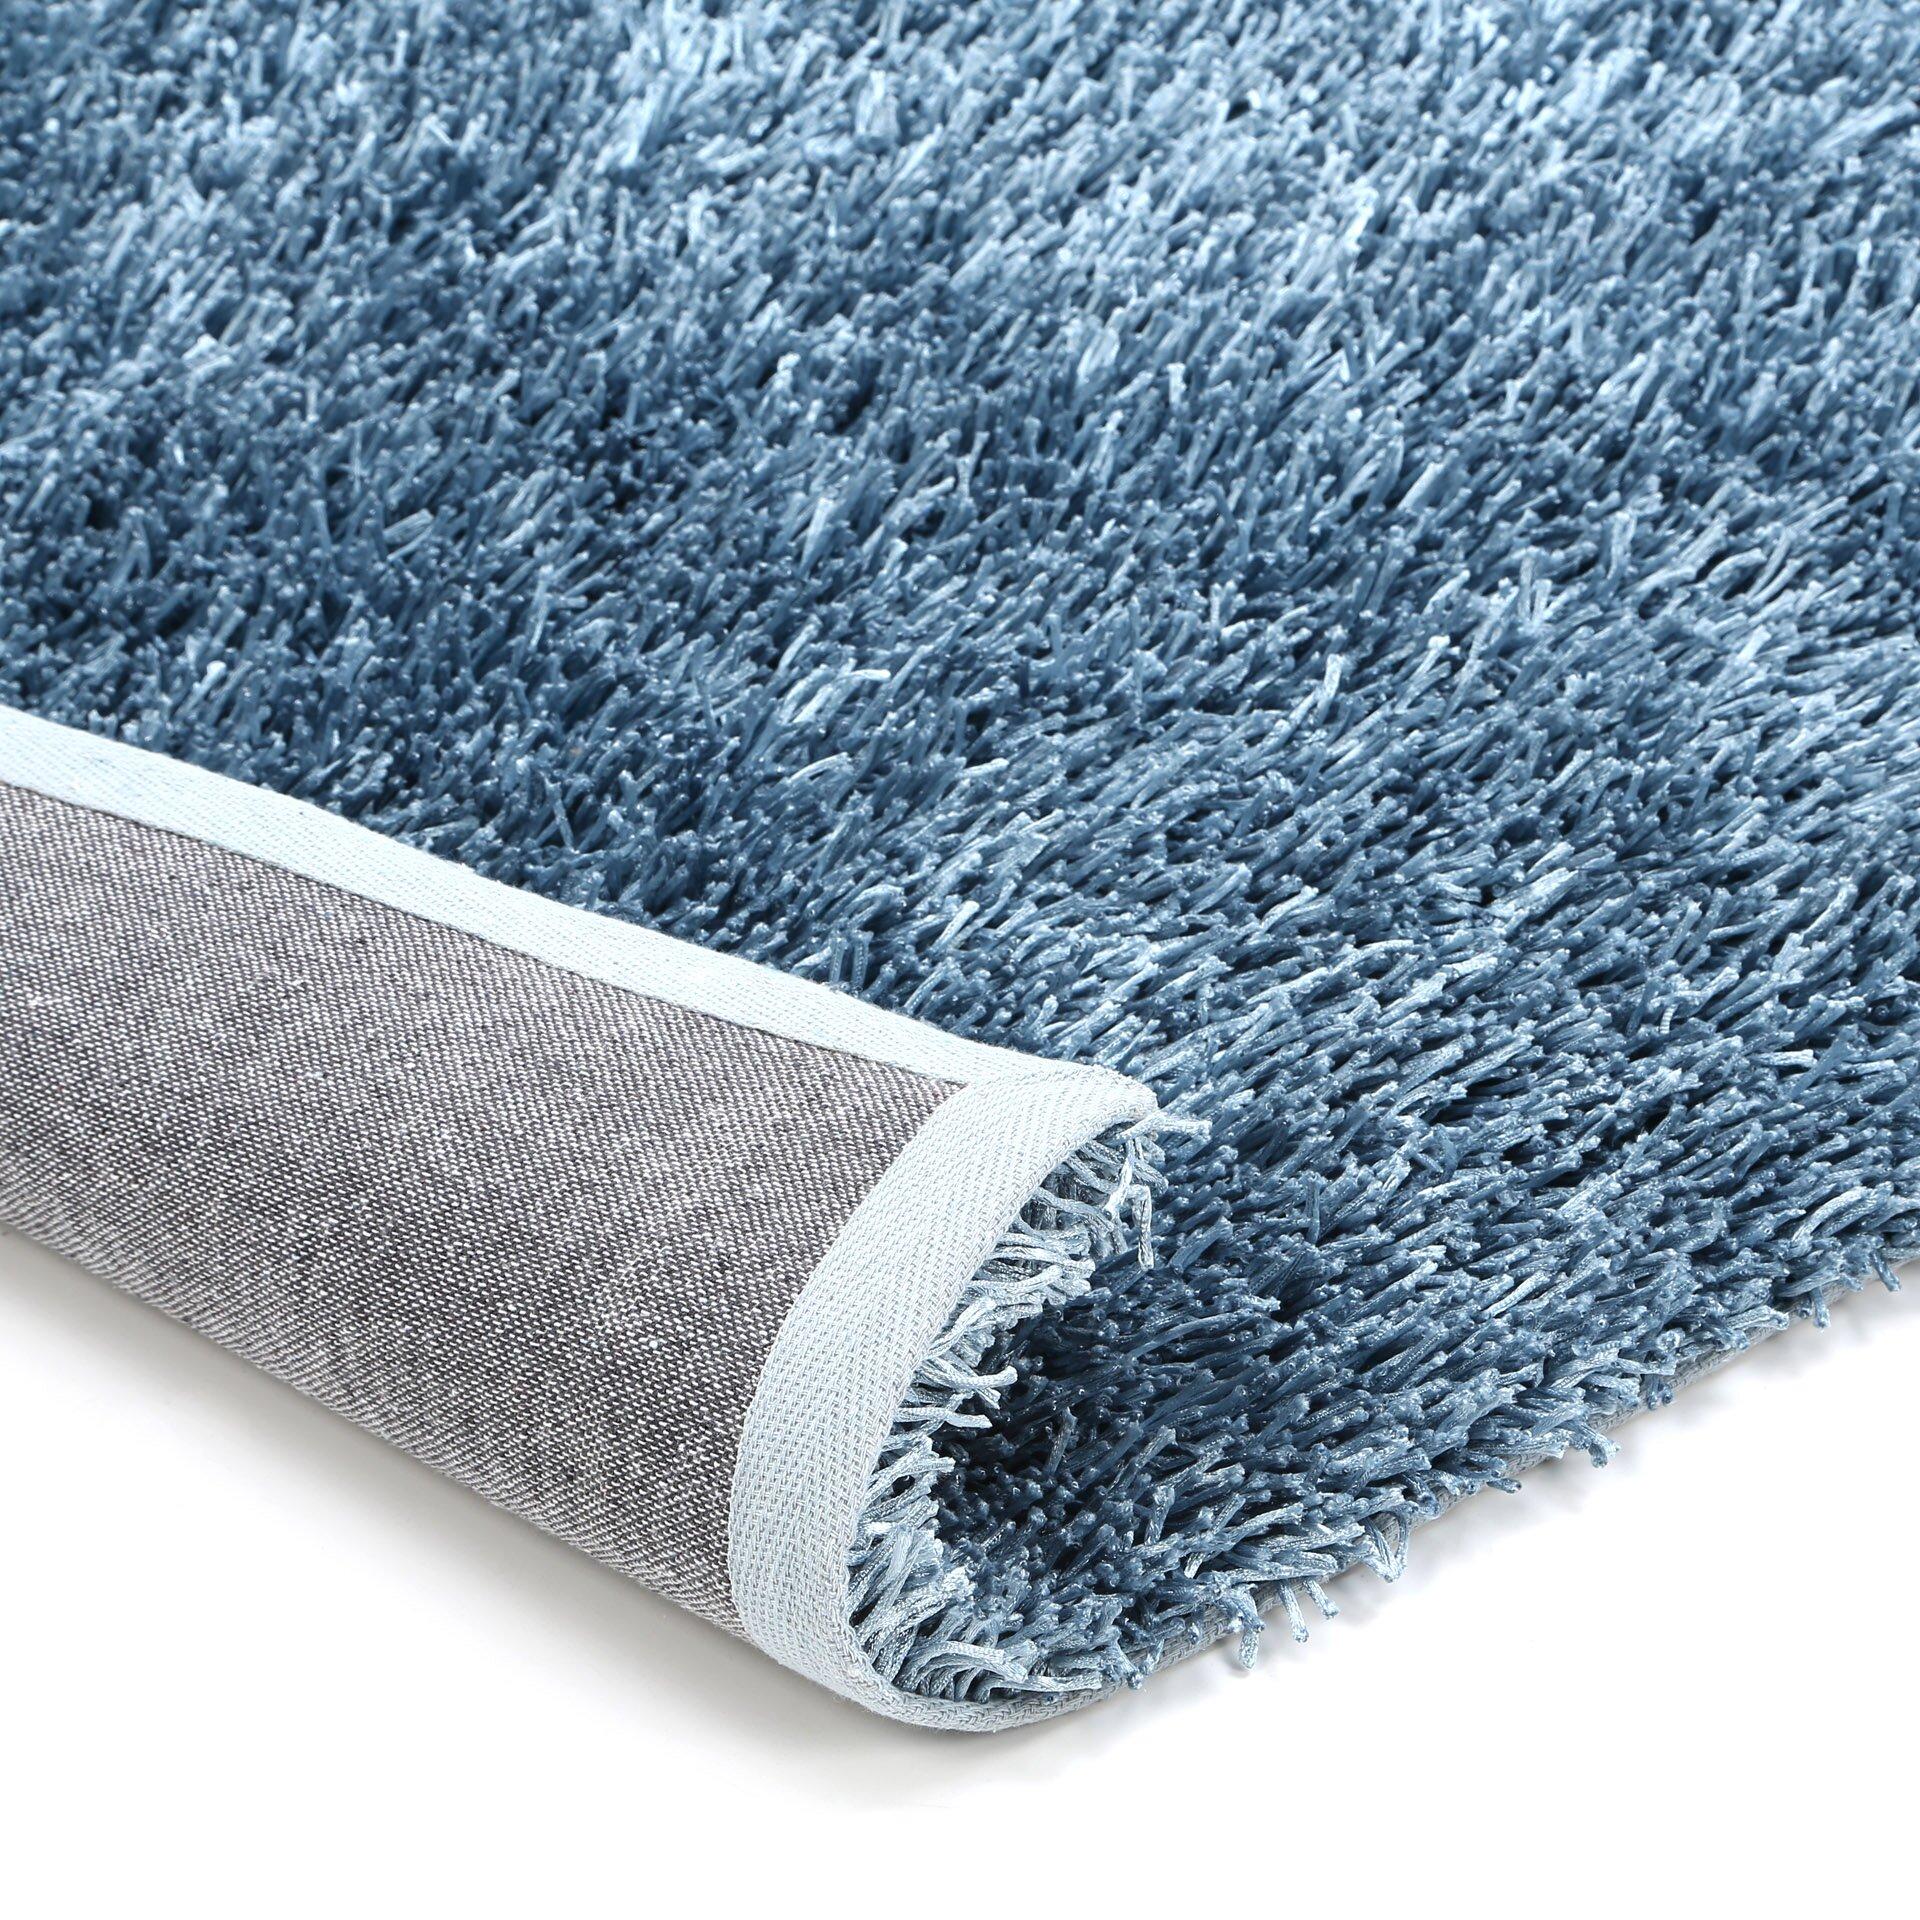 Dalyn Rug Co Illusions Shag Light Slate Blue Area Rug